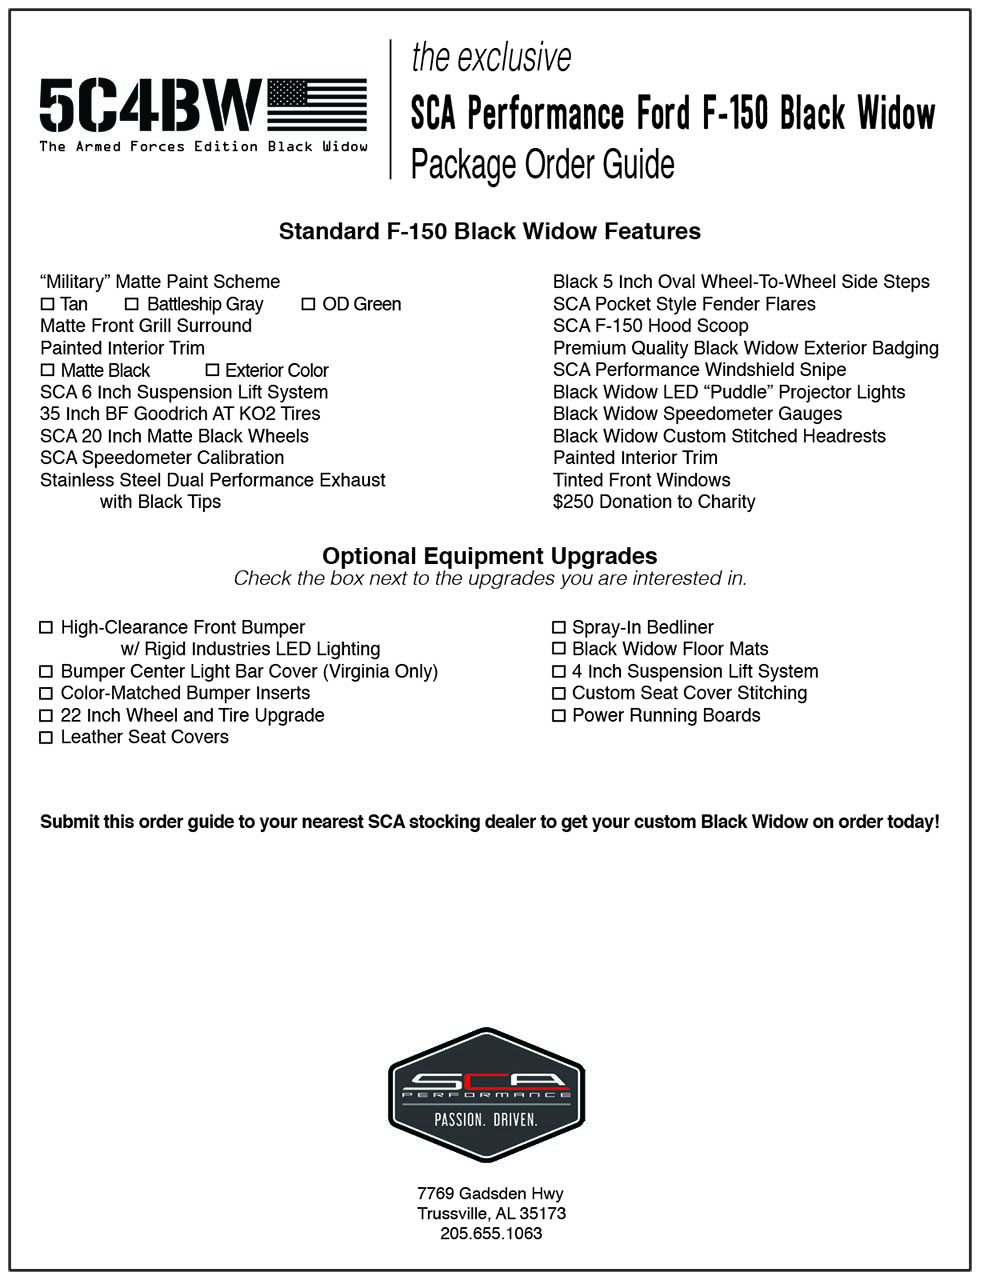 Ford F150 AFBW Black Widow Order Guide.jpg